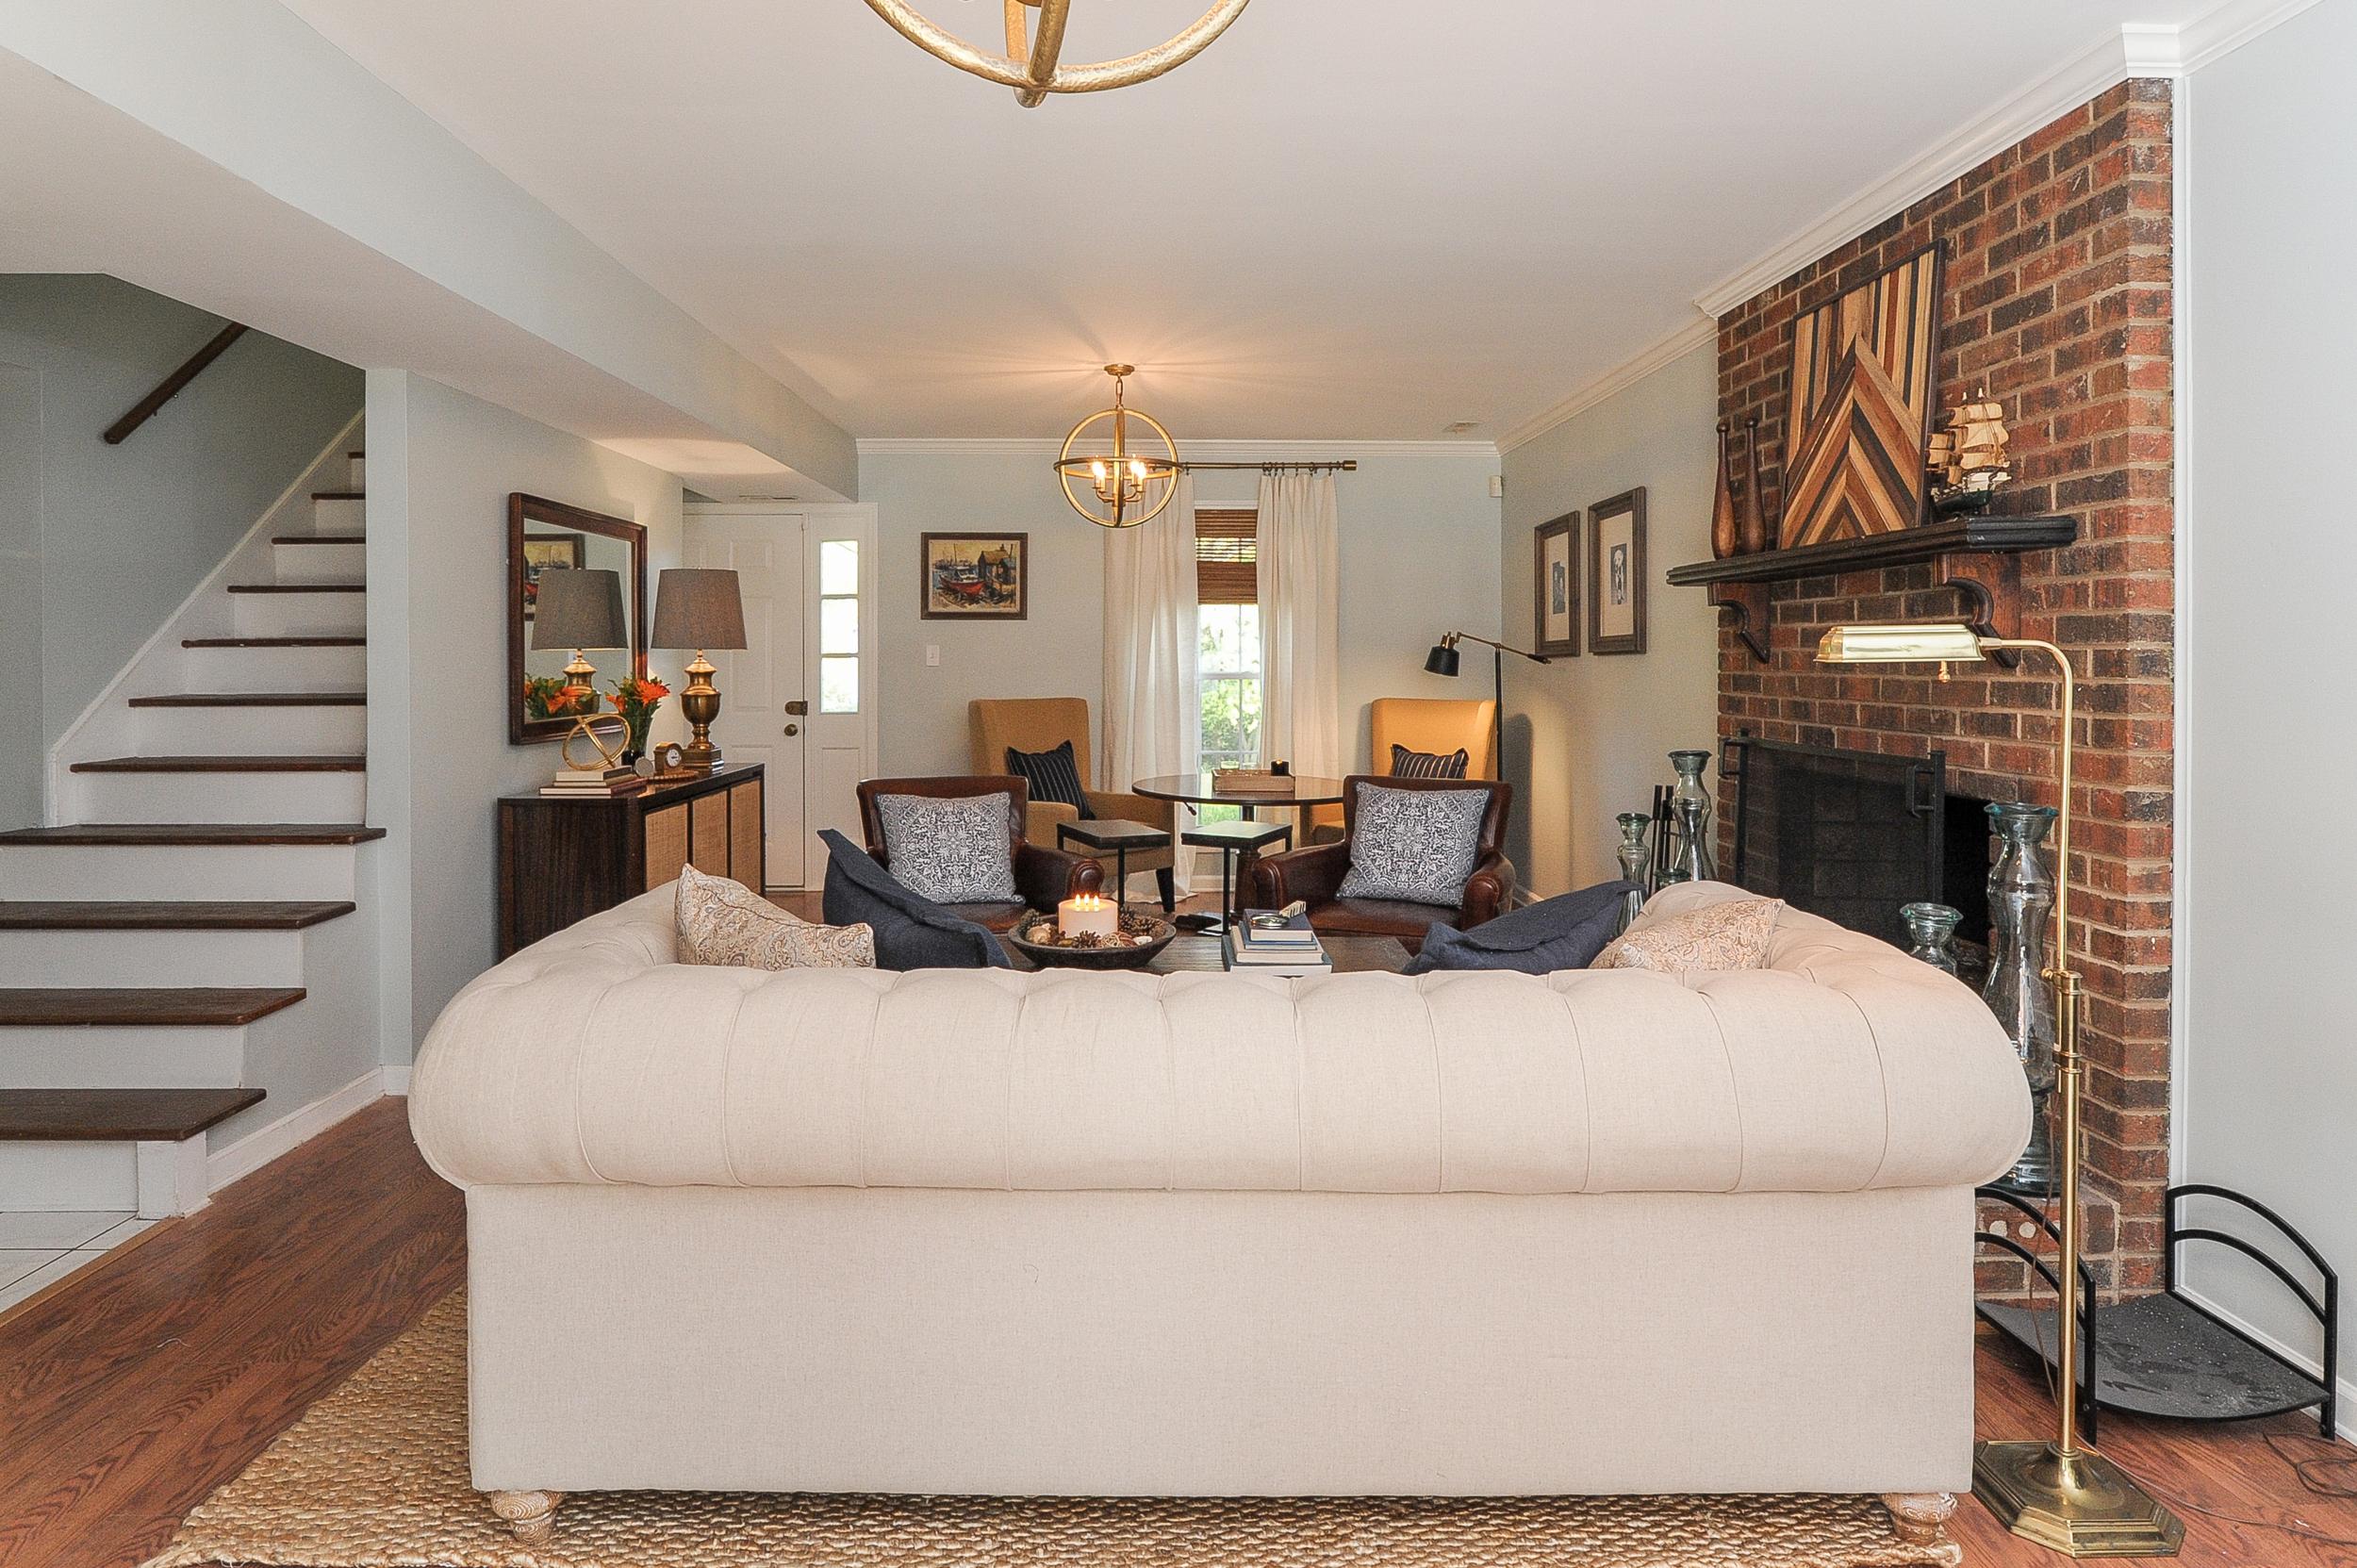 Artful Interiors - Bachelor Pad - Living Room 2